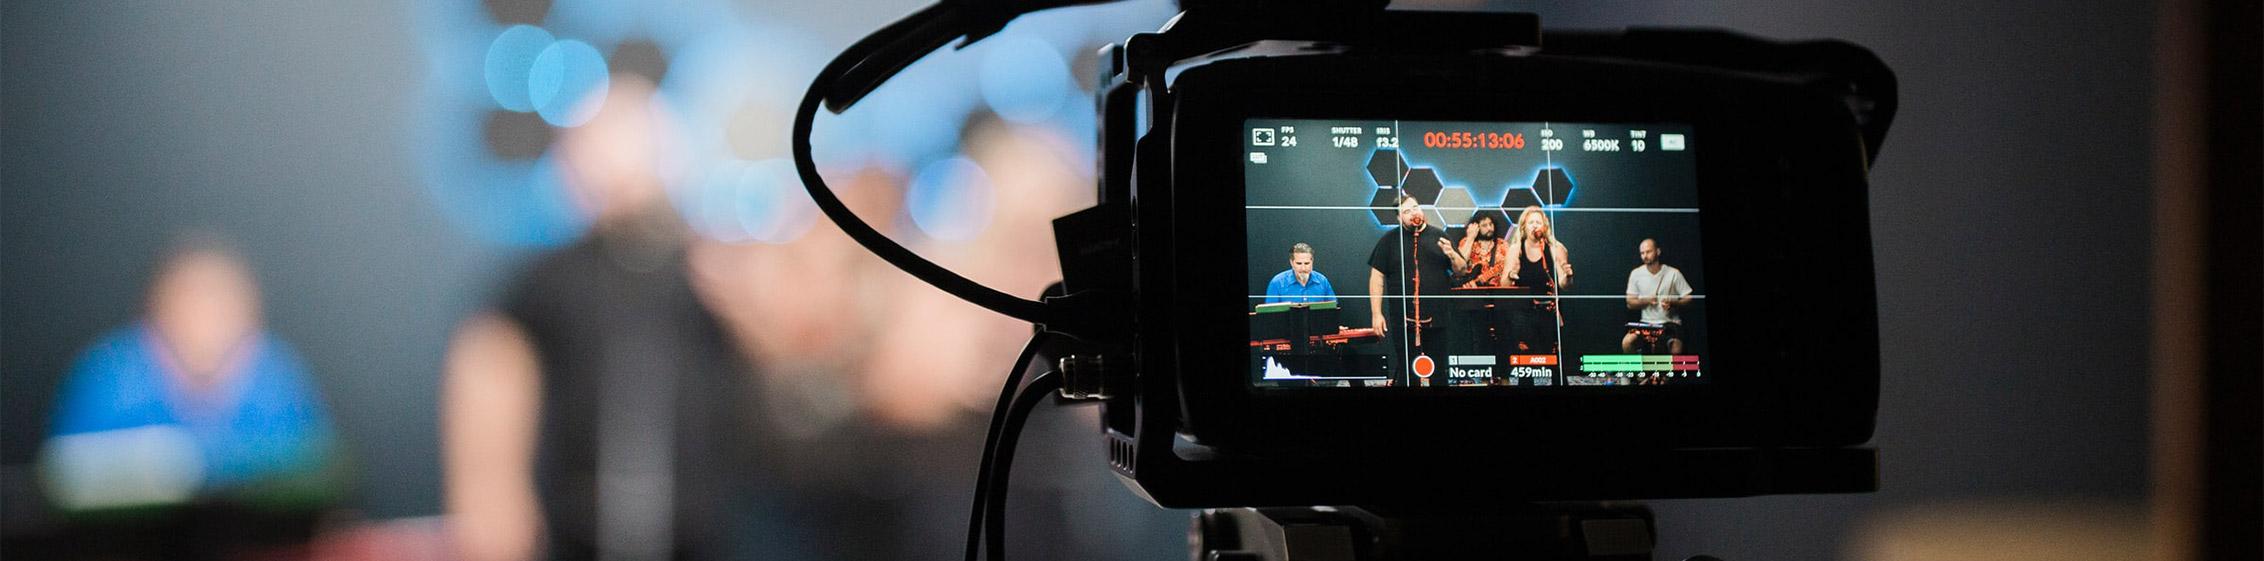 Top Video Marketing Trends in 2021